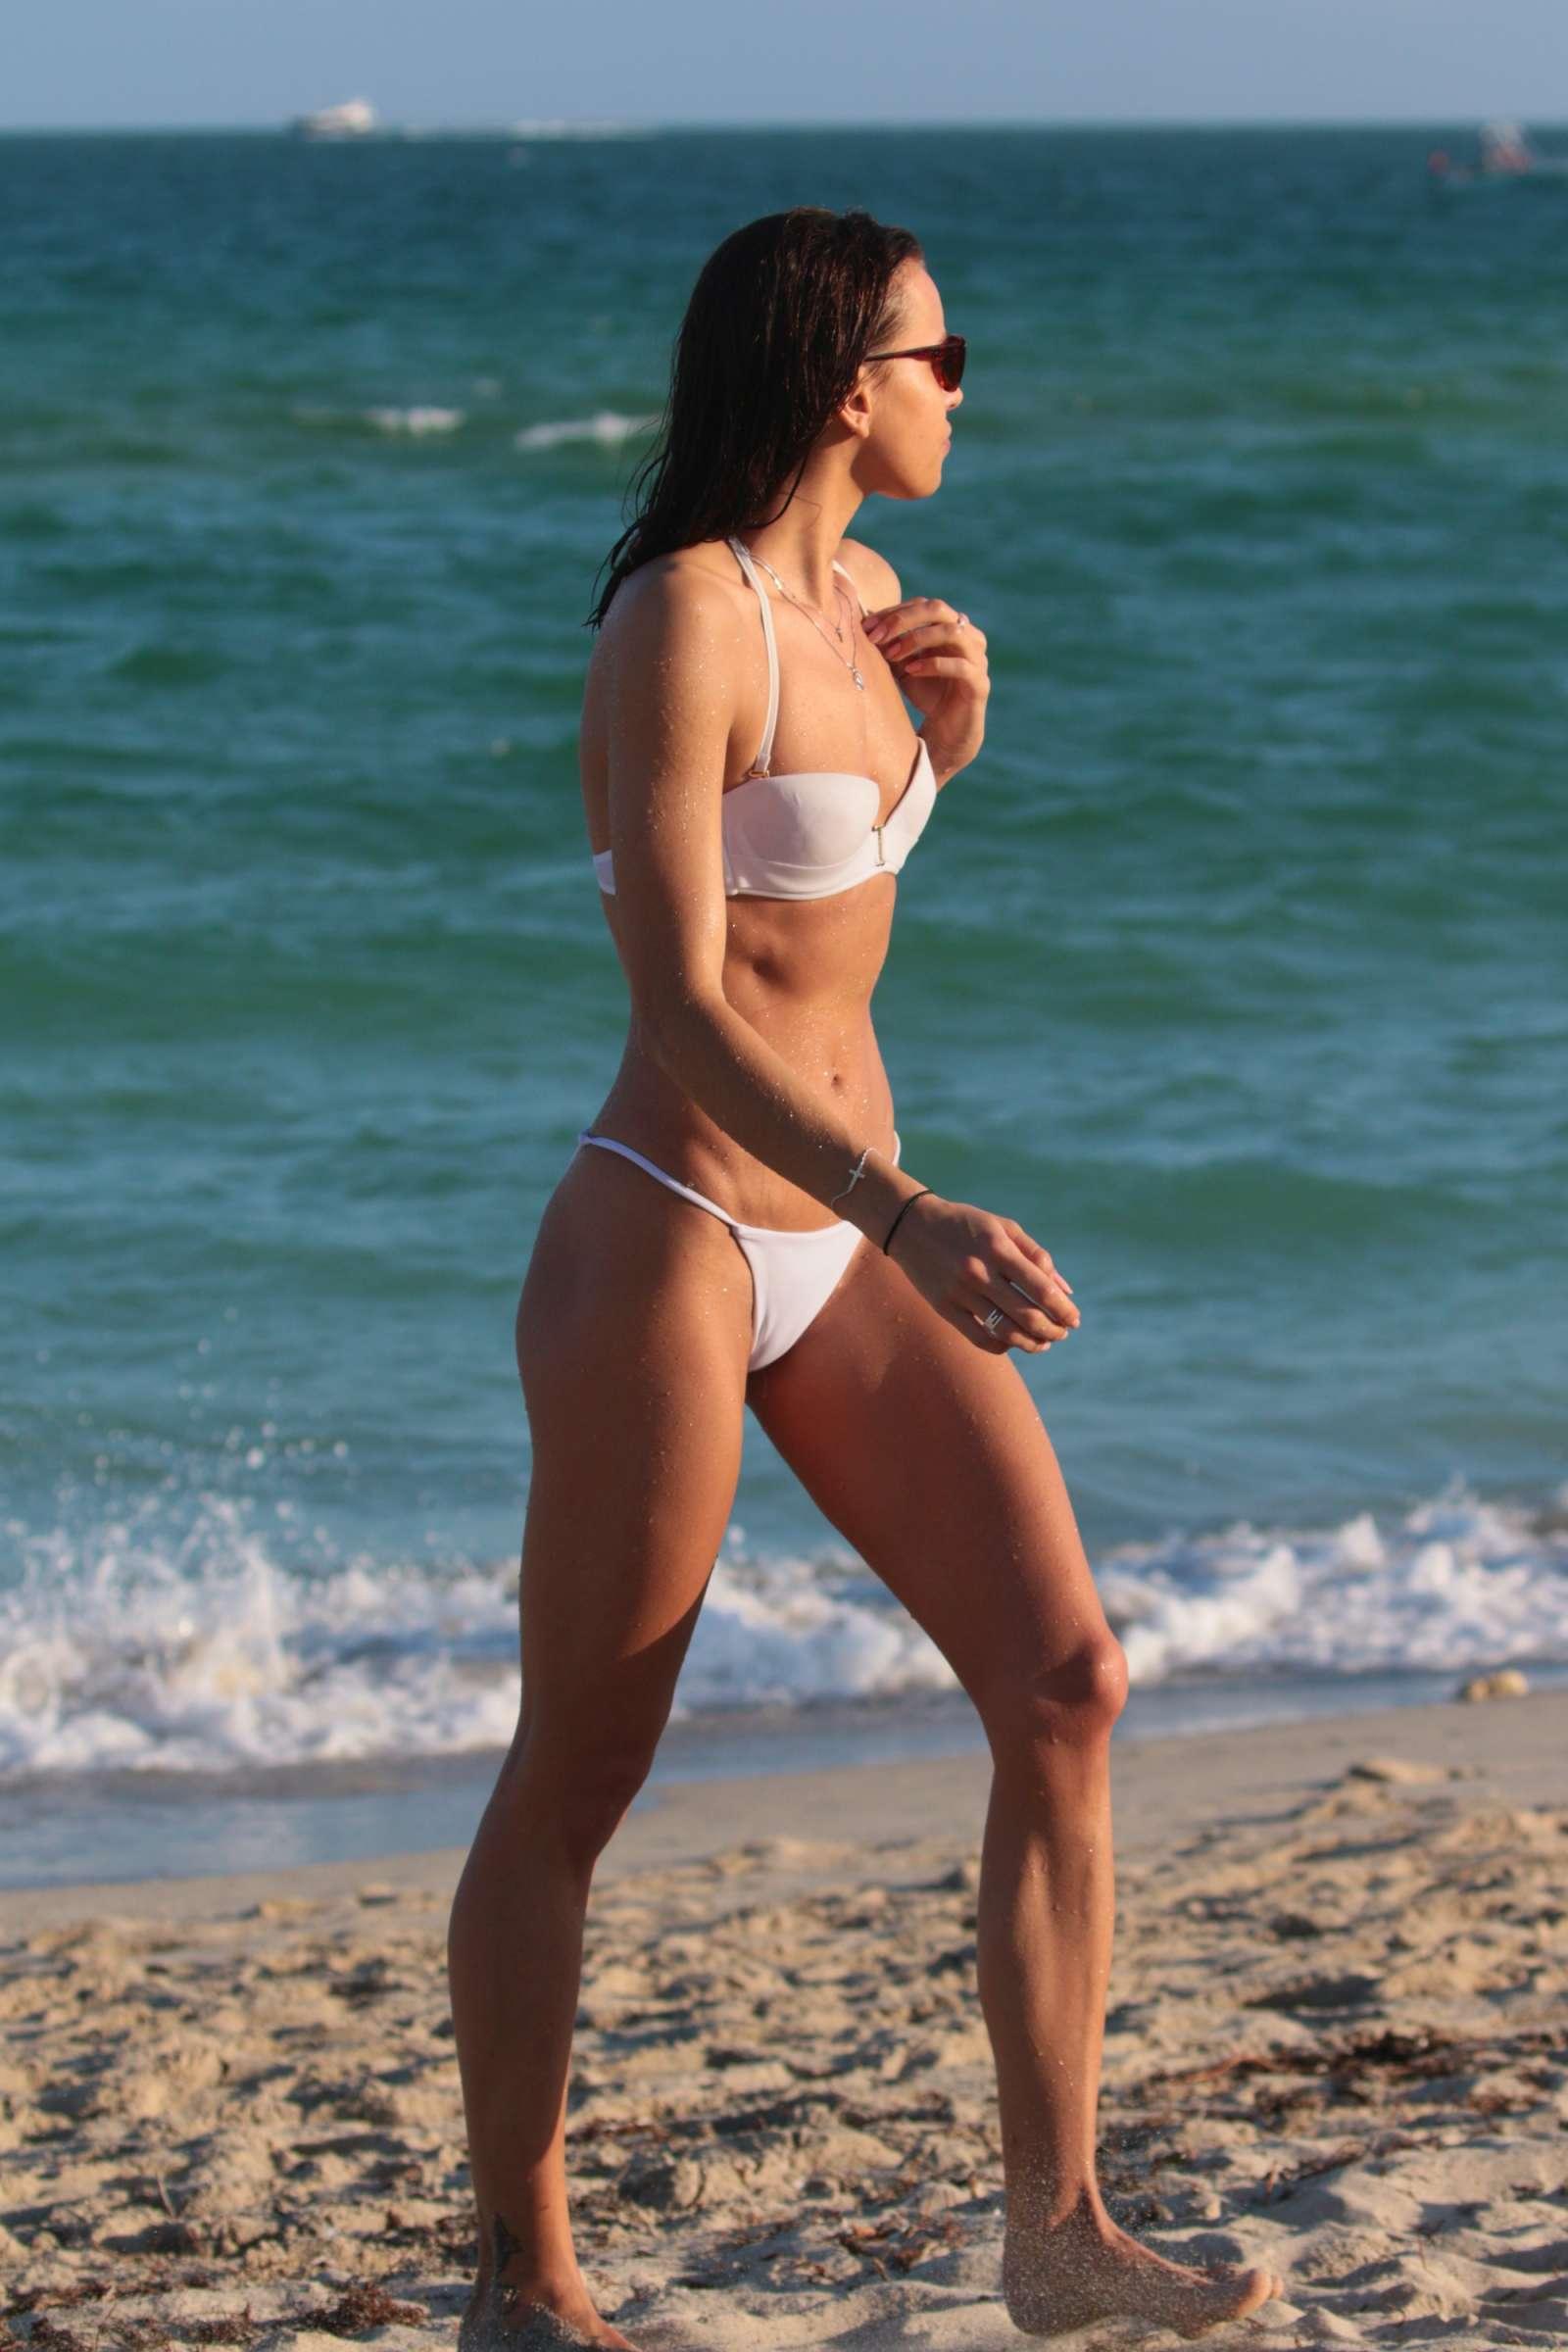 Meri Gulin naked (15 fotos), pictures Tits, Instagram, panties 2015